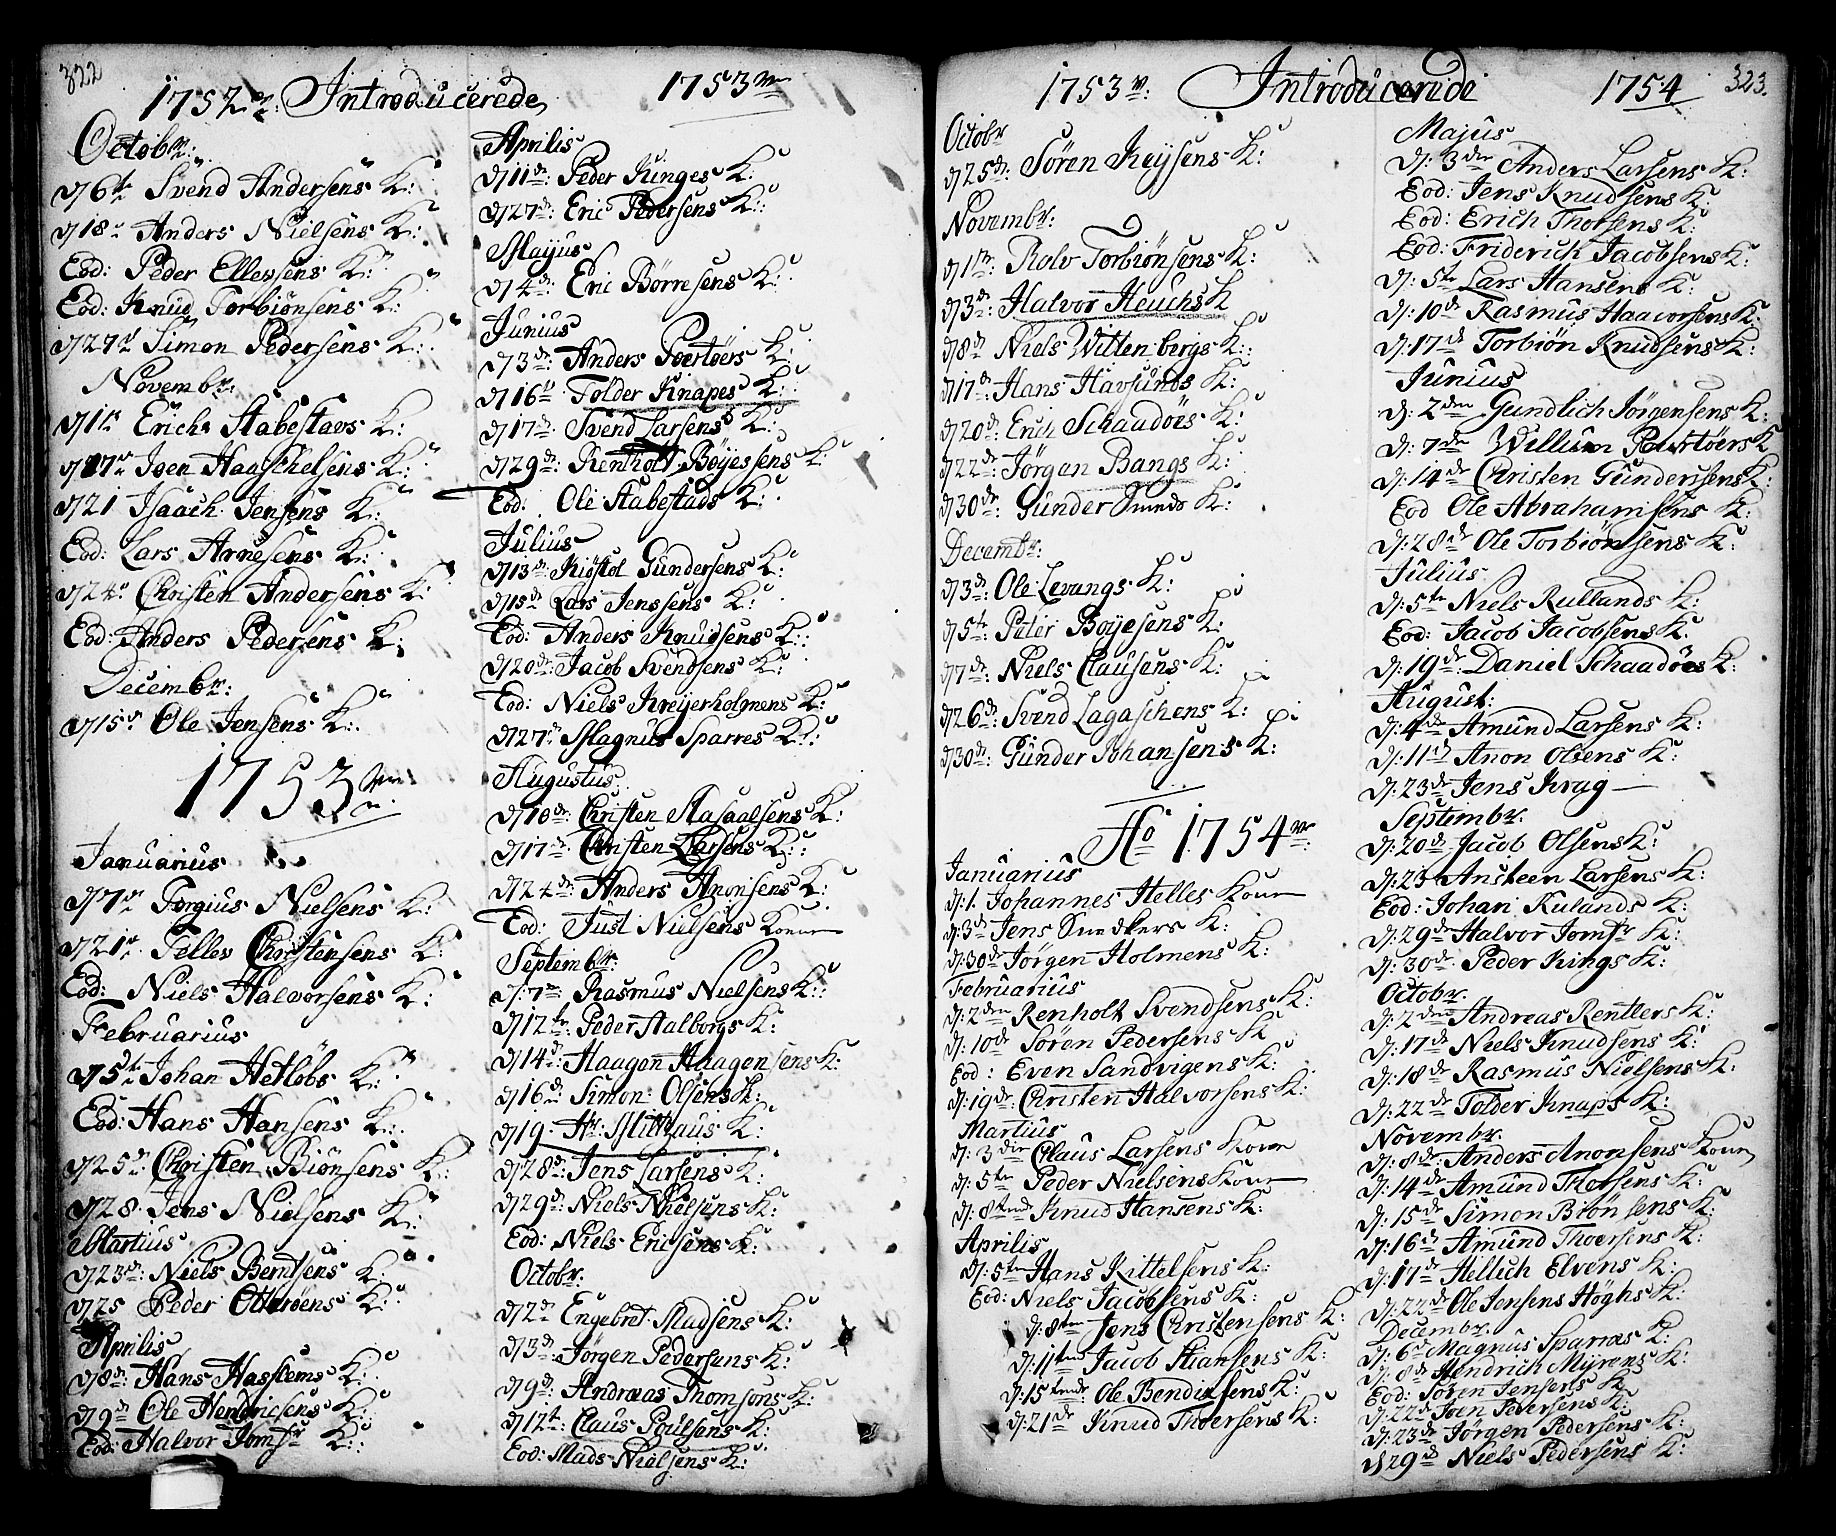 SAKO, Kragerø kirkebøker, F/Fa/L0001: Ministerialbok nr. 1, 1702-1766, s. 322-323